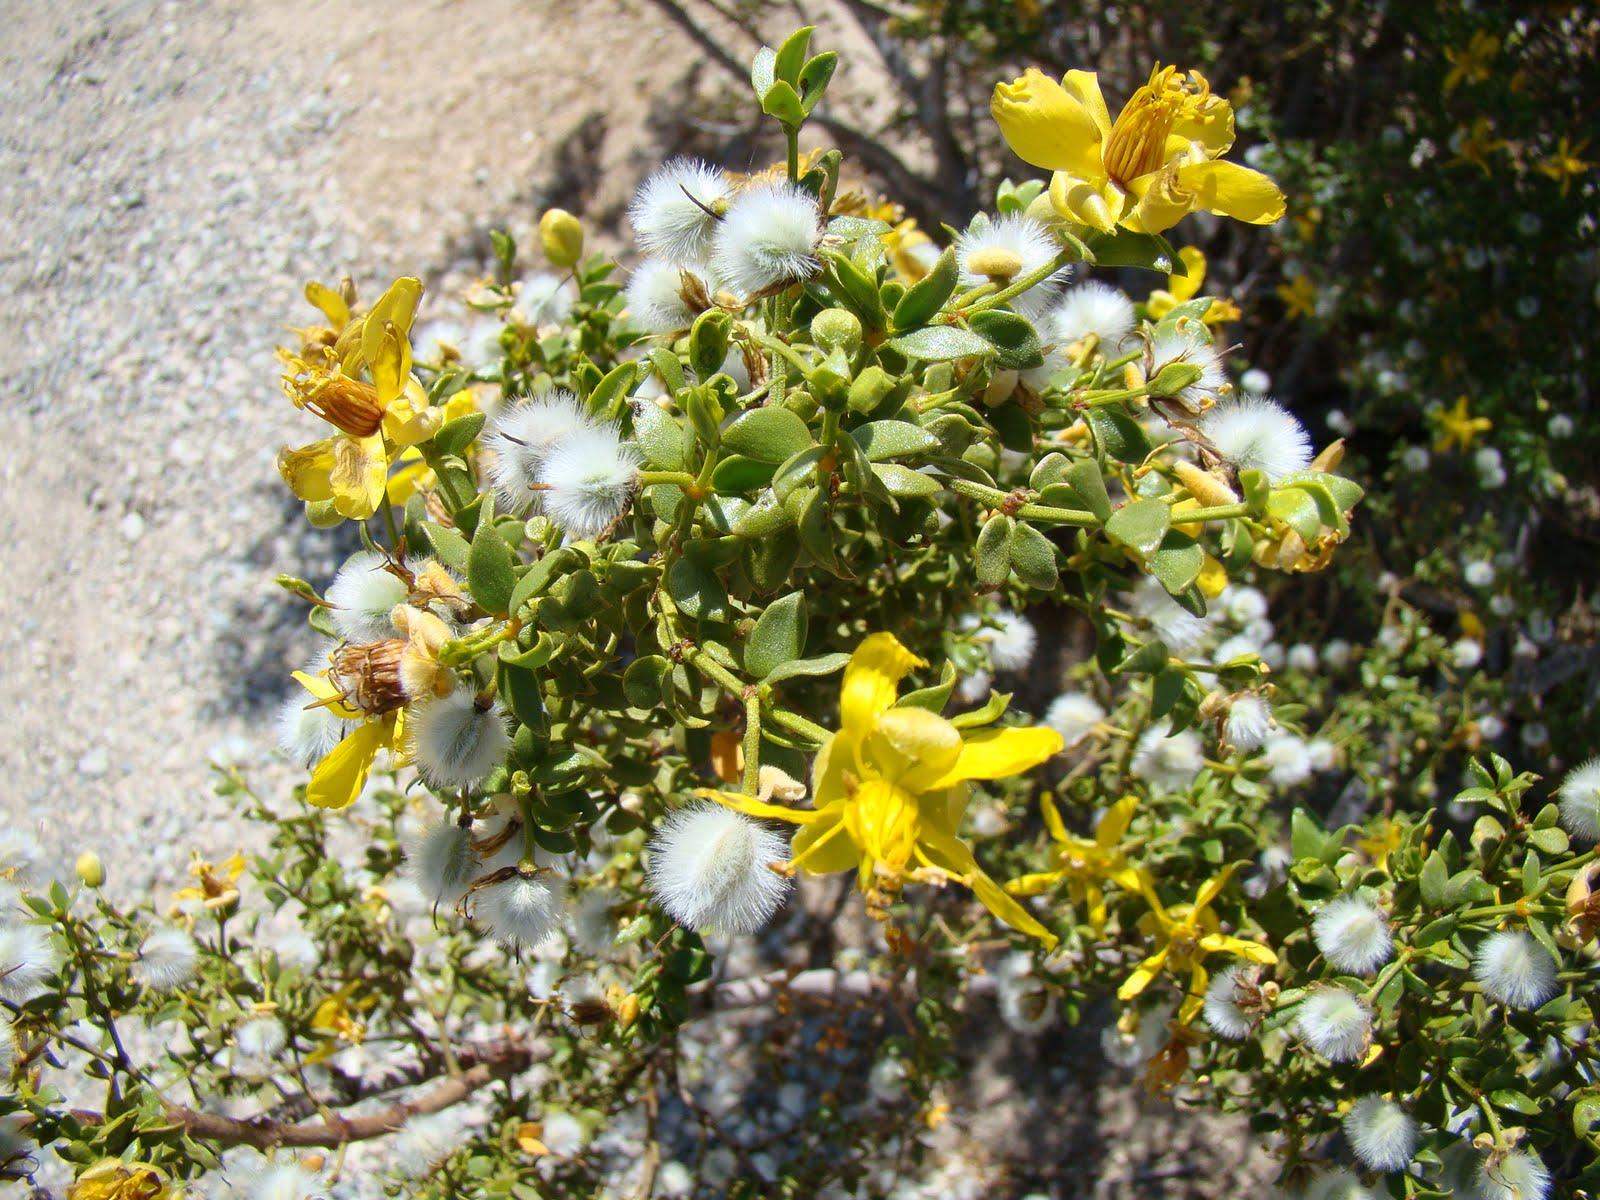 Leaves Of Plants Creosote Bush